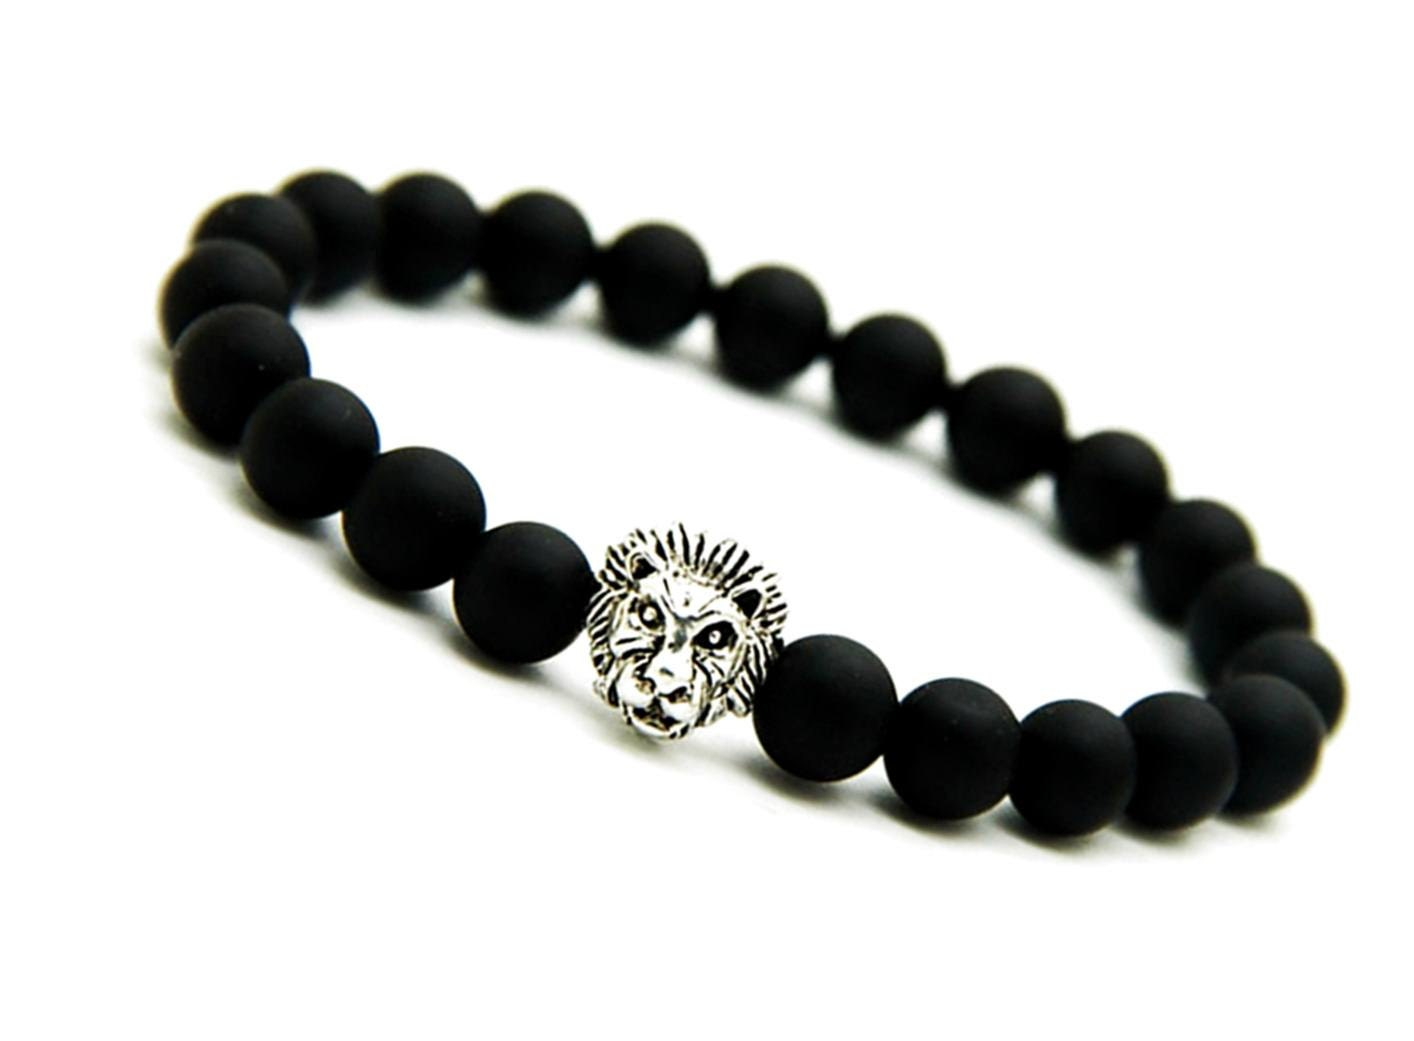 Matte Black Onyx Bracelet, Silver Lion Bracelet Mens, Onyx Lion Bracelet,  Stretch Bracelet